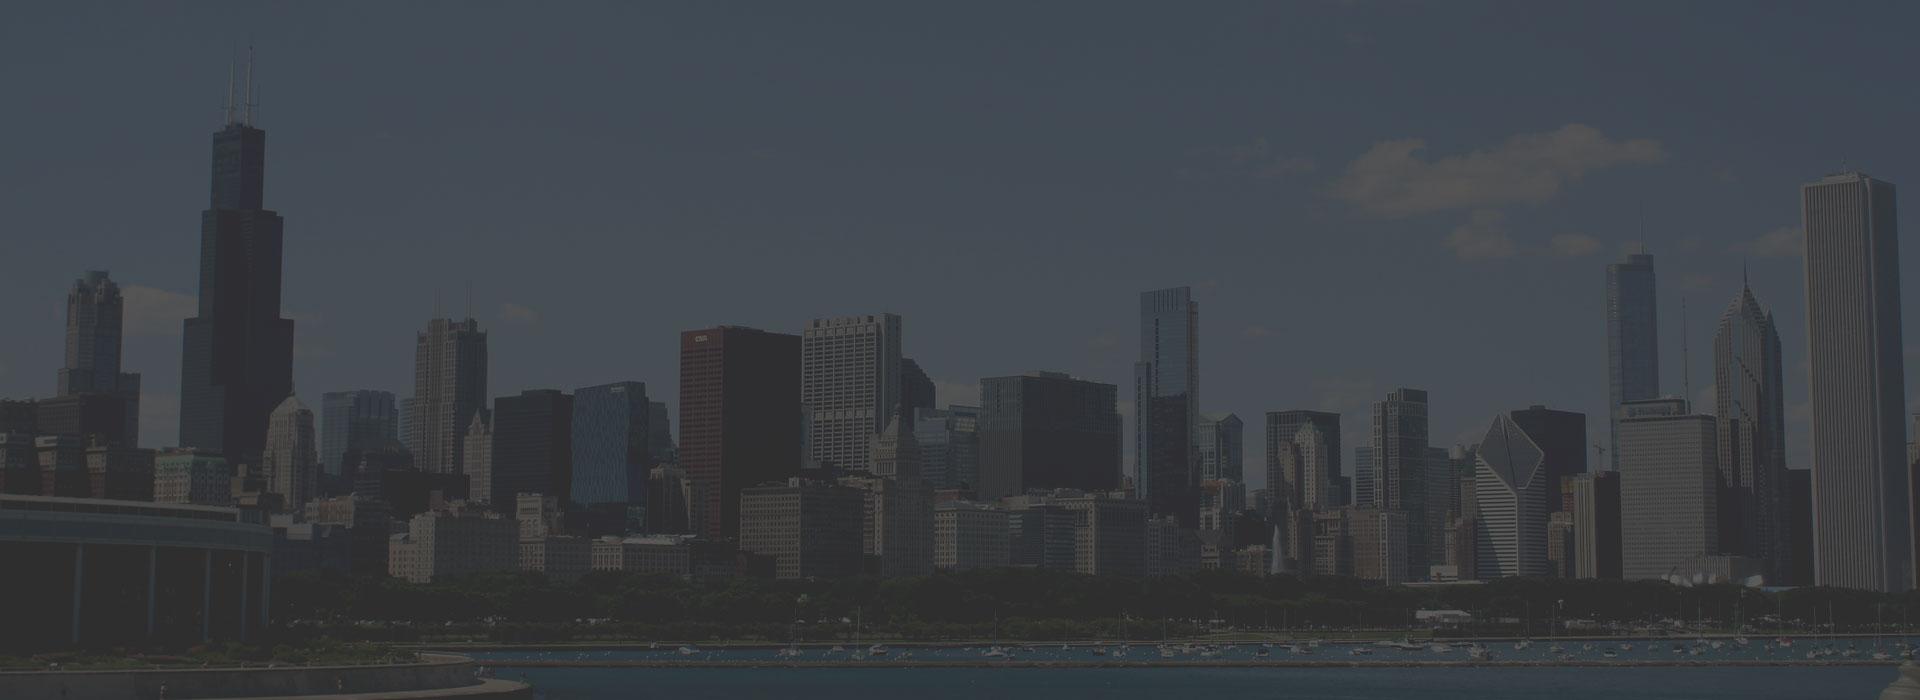 NetSuite Chicago